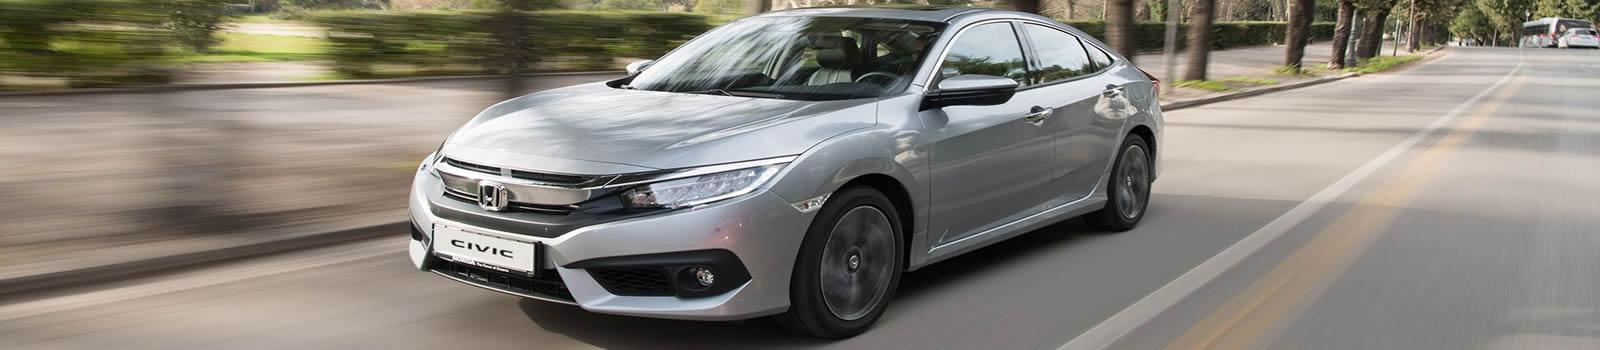 <div class='animated tada'><a href='https://www.silverarackiralama.com/araclar' ><h1>Honda Civic (2018)</h1></div><br/><span><span>Günlük 220 TL'den Başlayan Fiyatlarla</span></span></a>